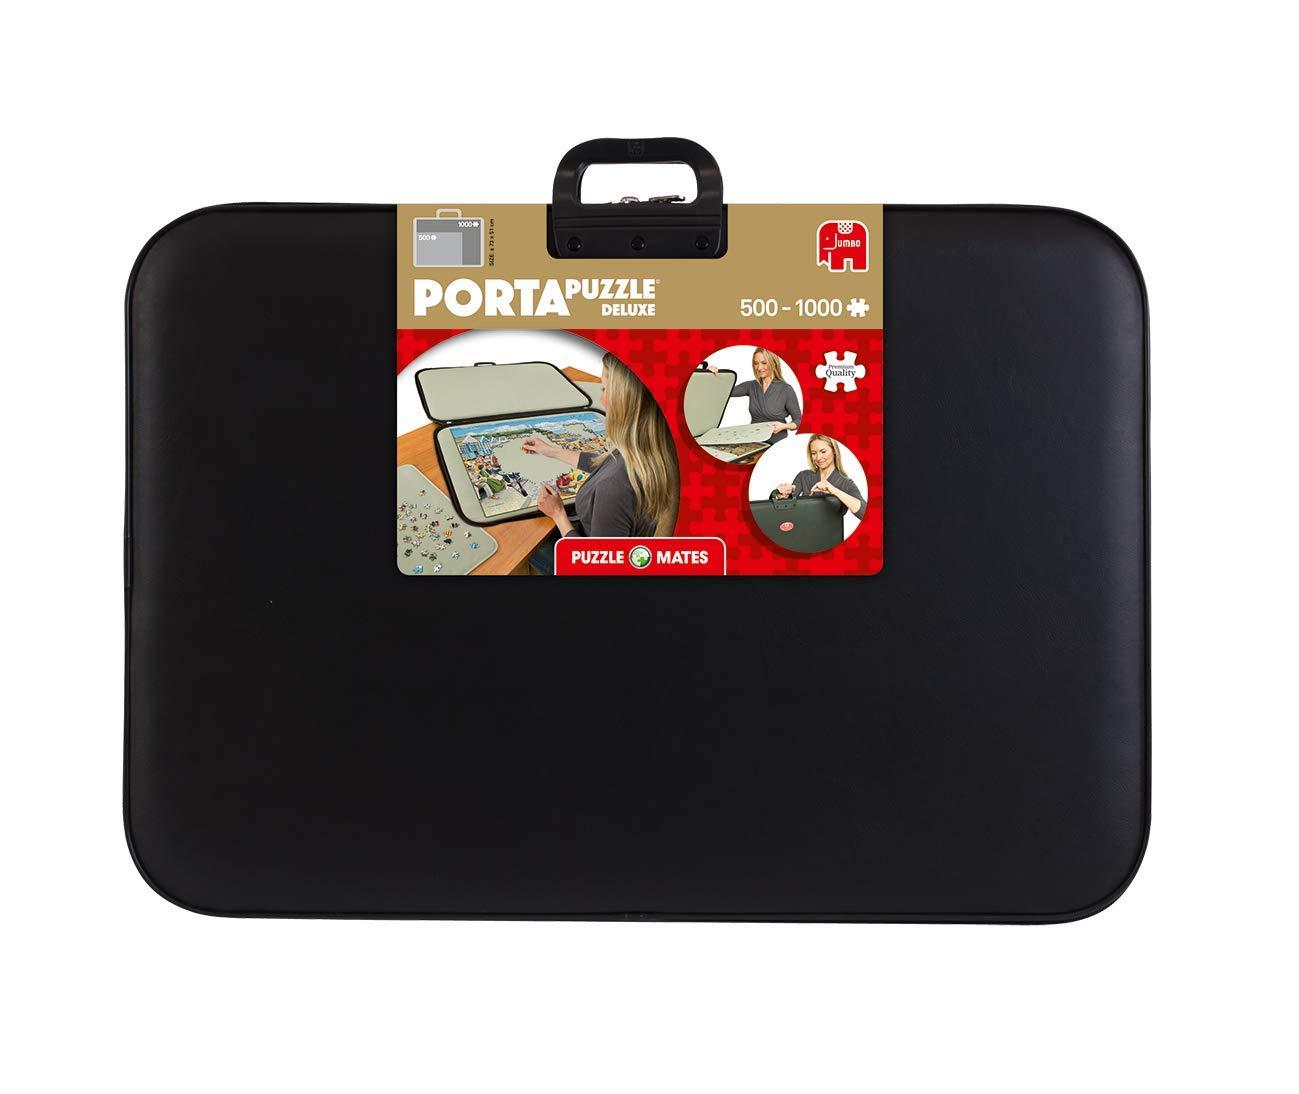 JUMBO 01039 Puzzle Accessories - Portapuzzle Deluxe 1000pcs